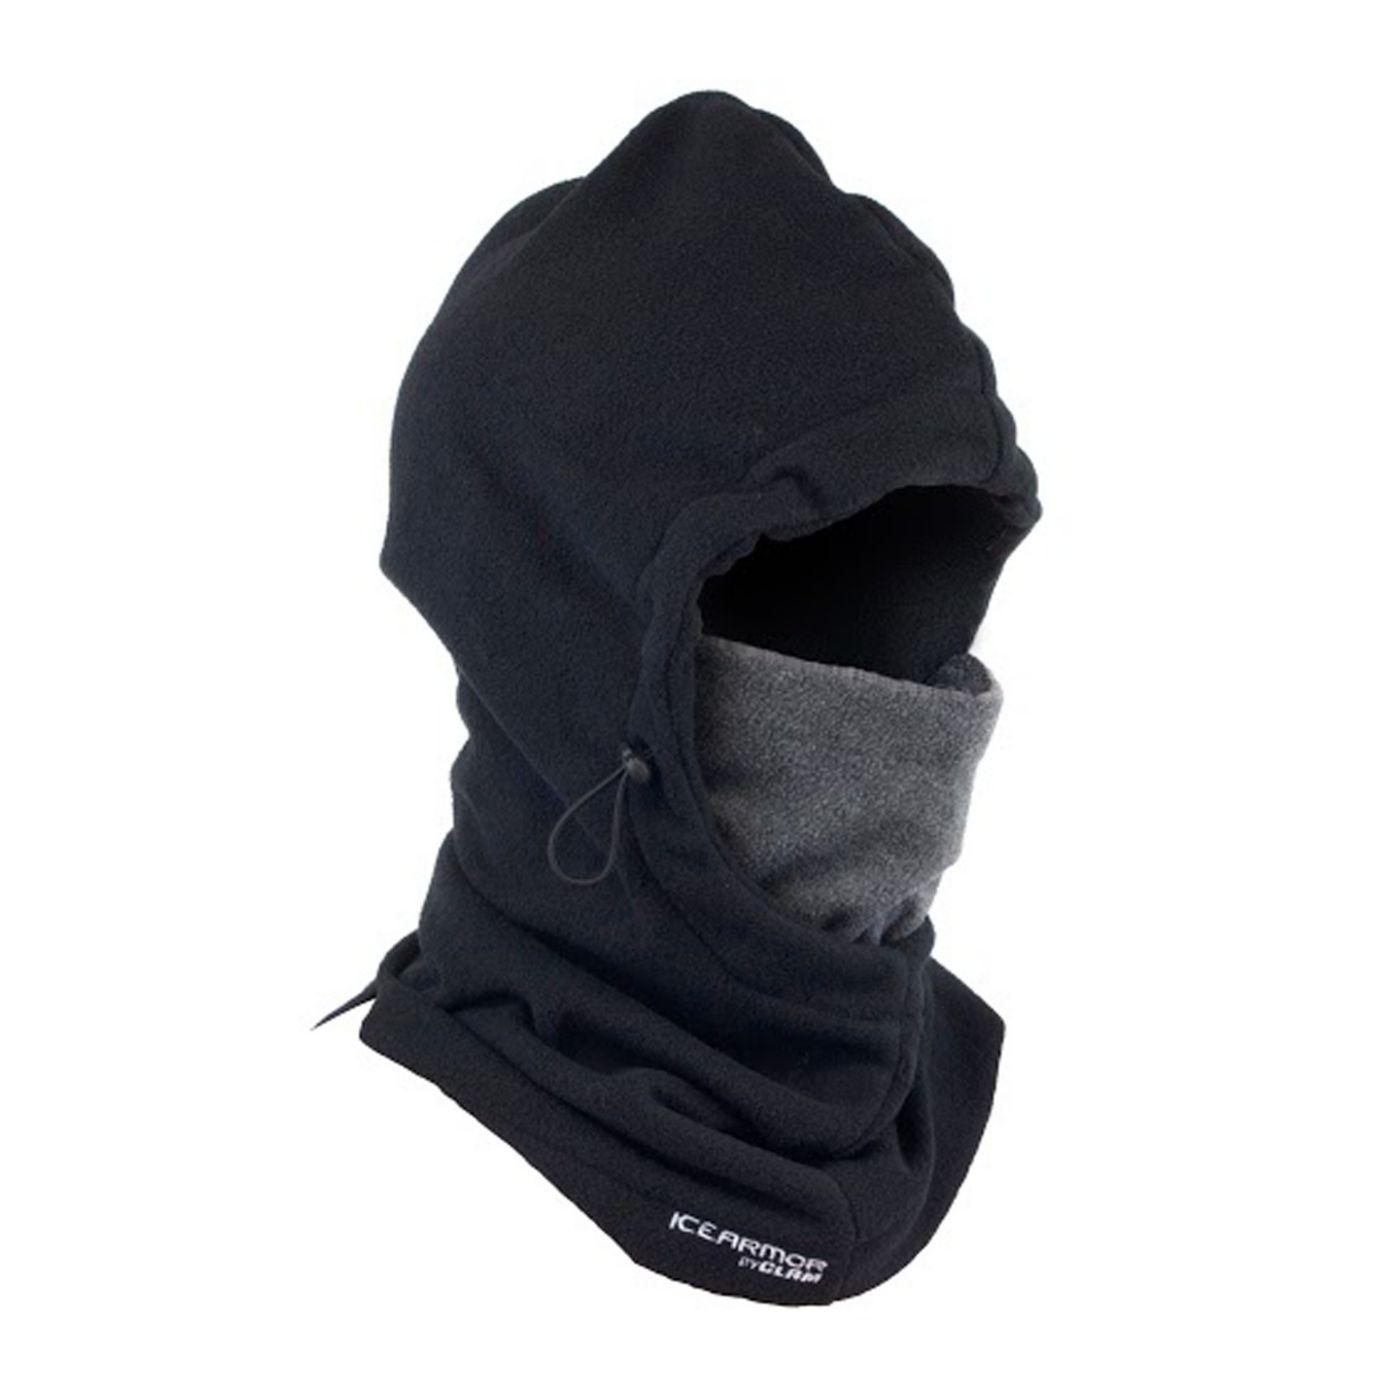 Clam IceArmor Men's Hoodie Facemask